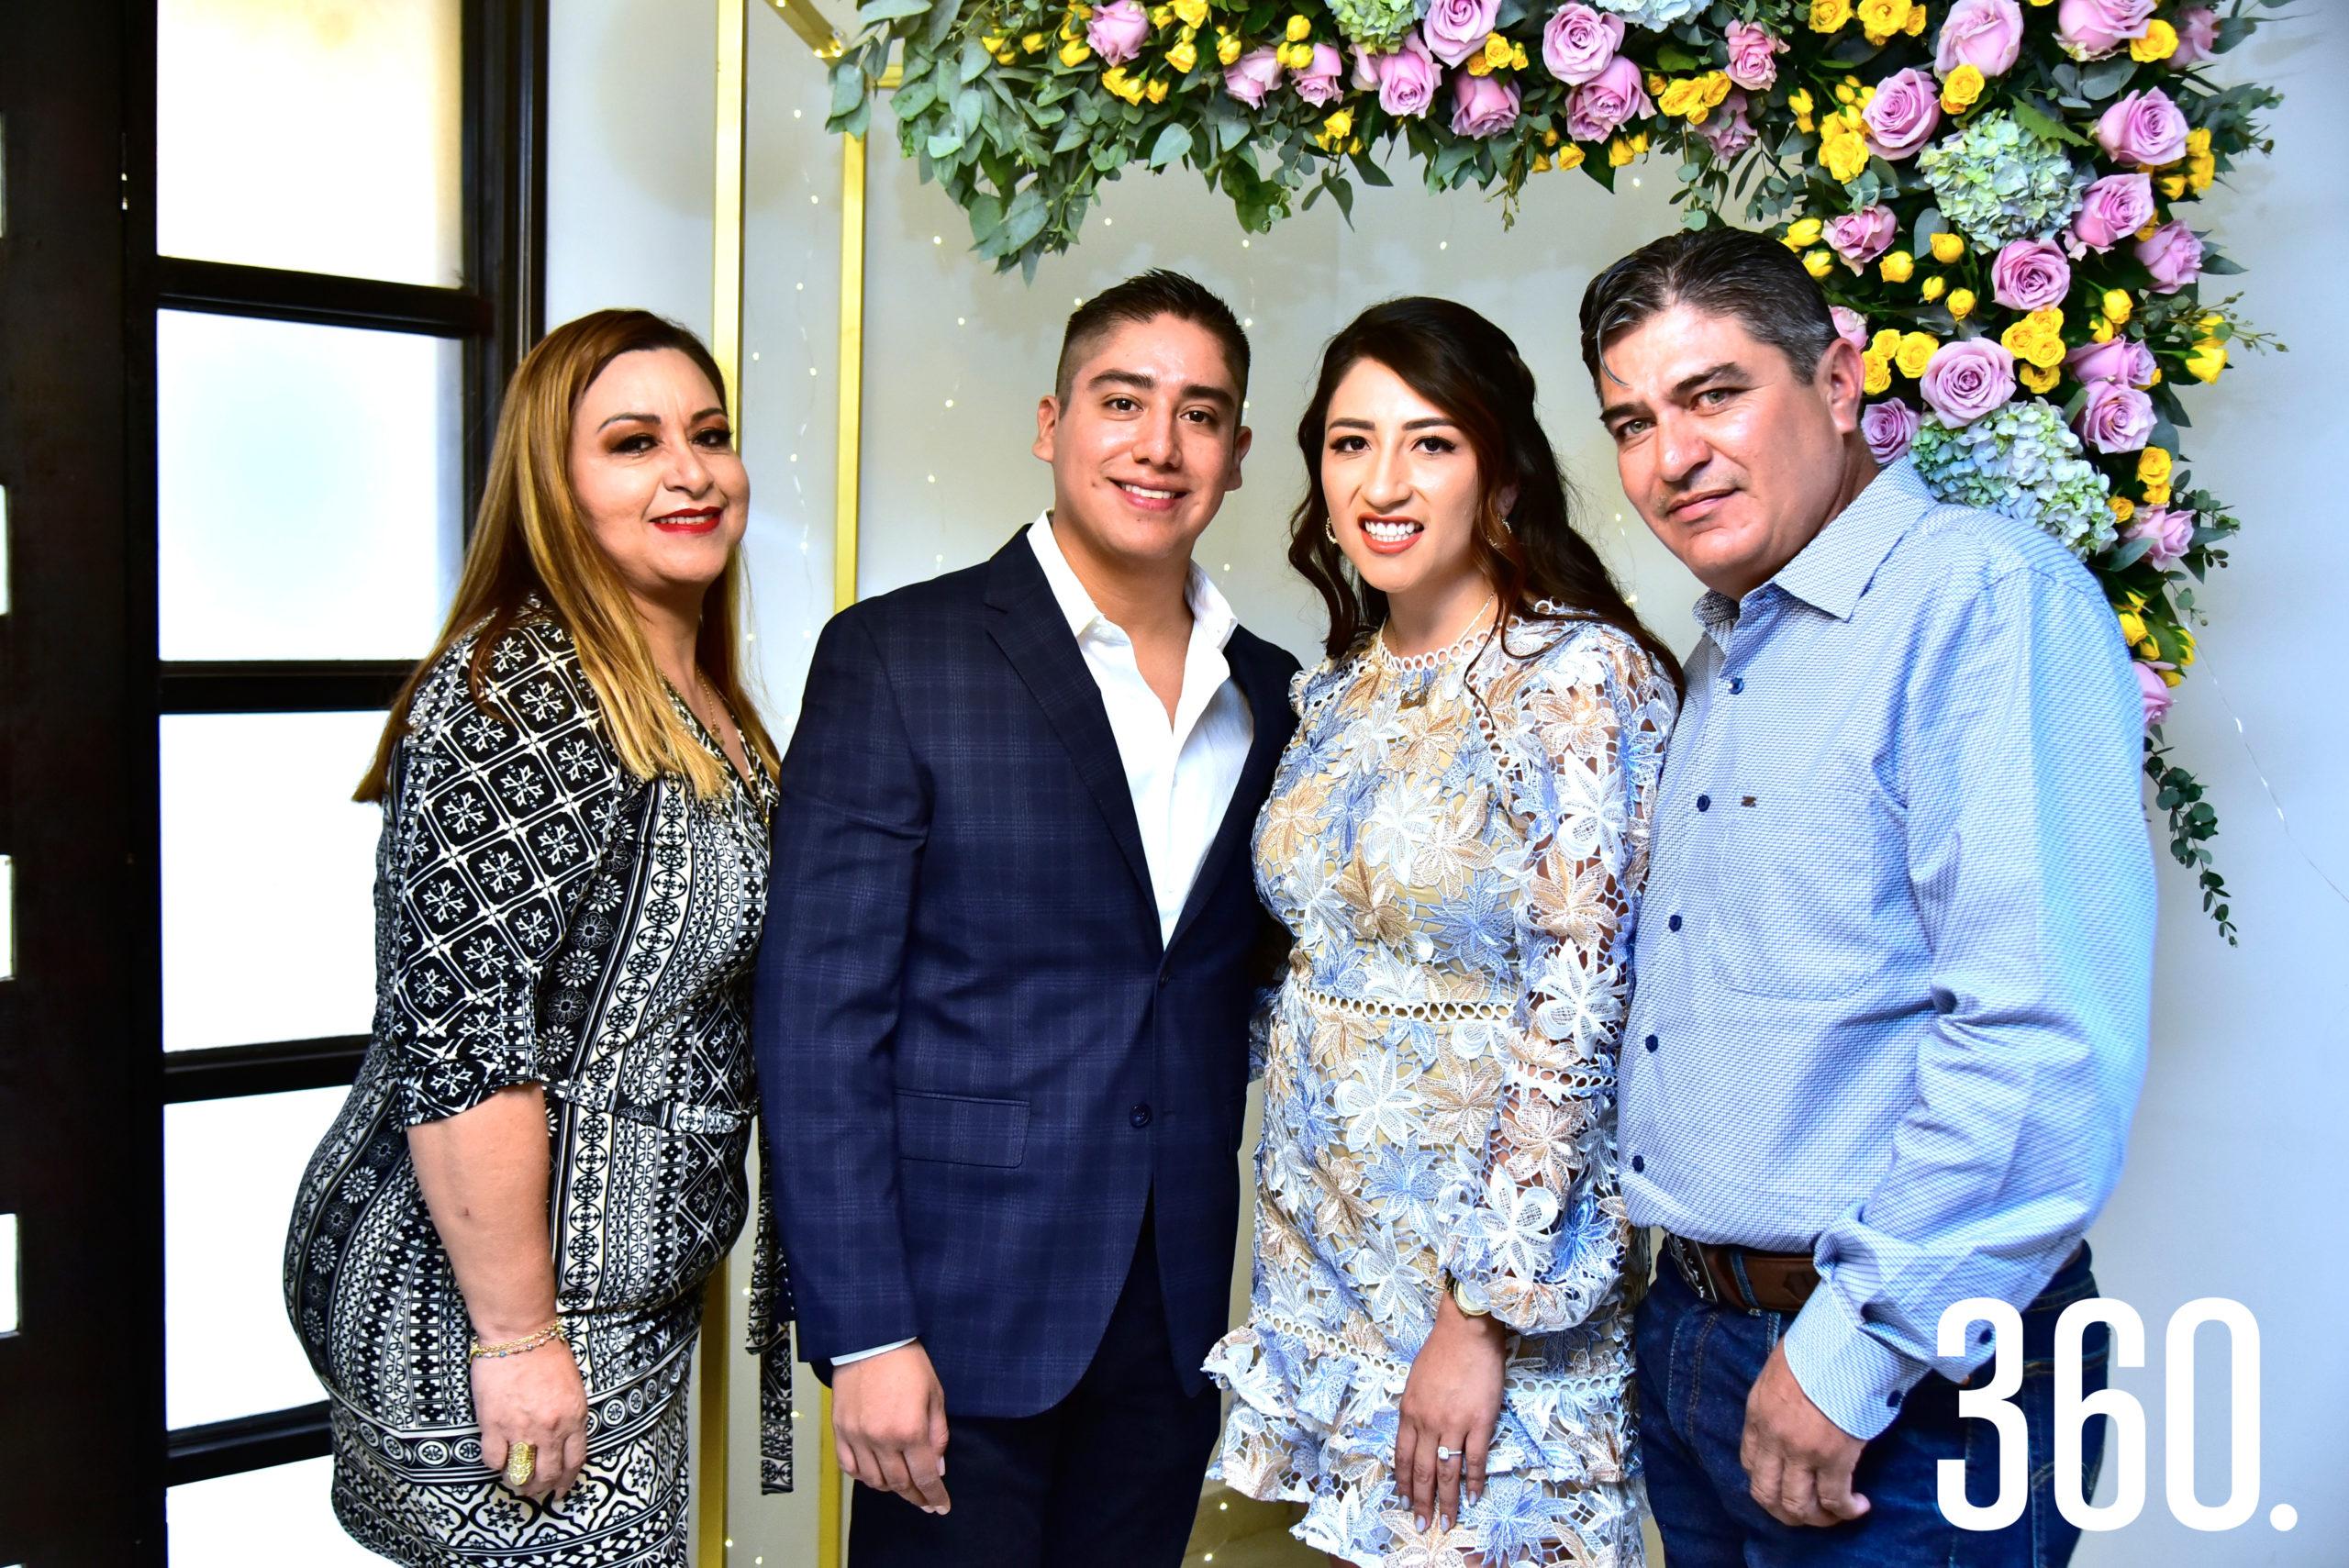 Mayra García, Jonathan Jiménez, Janeth Espinosa y Edgar Espinosa.